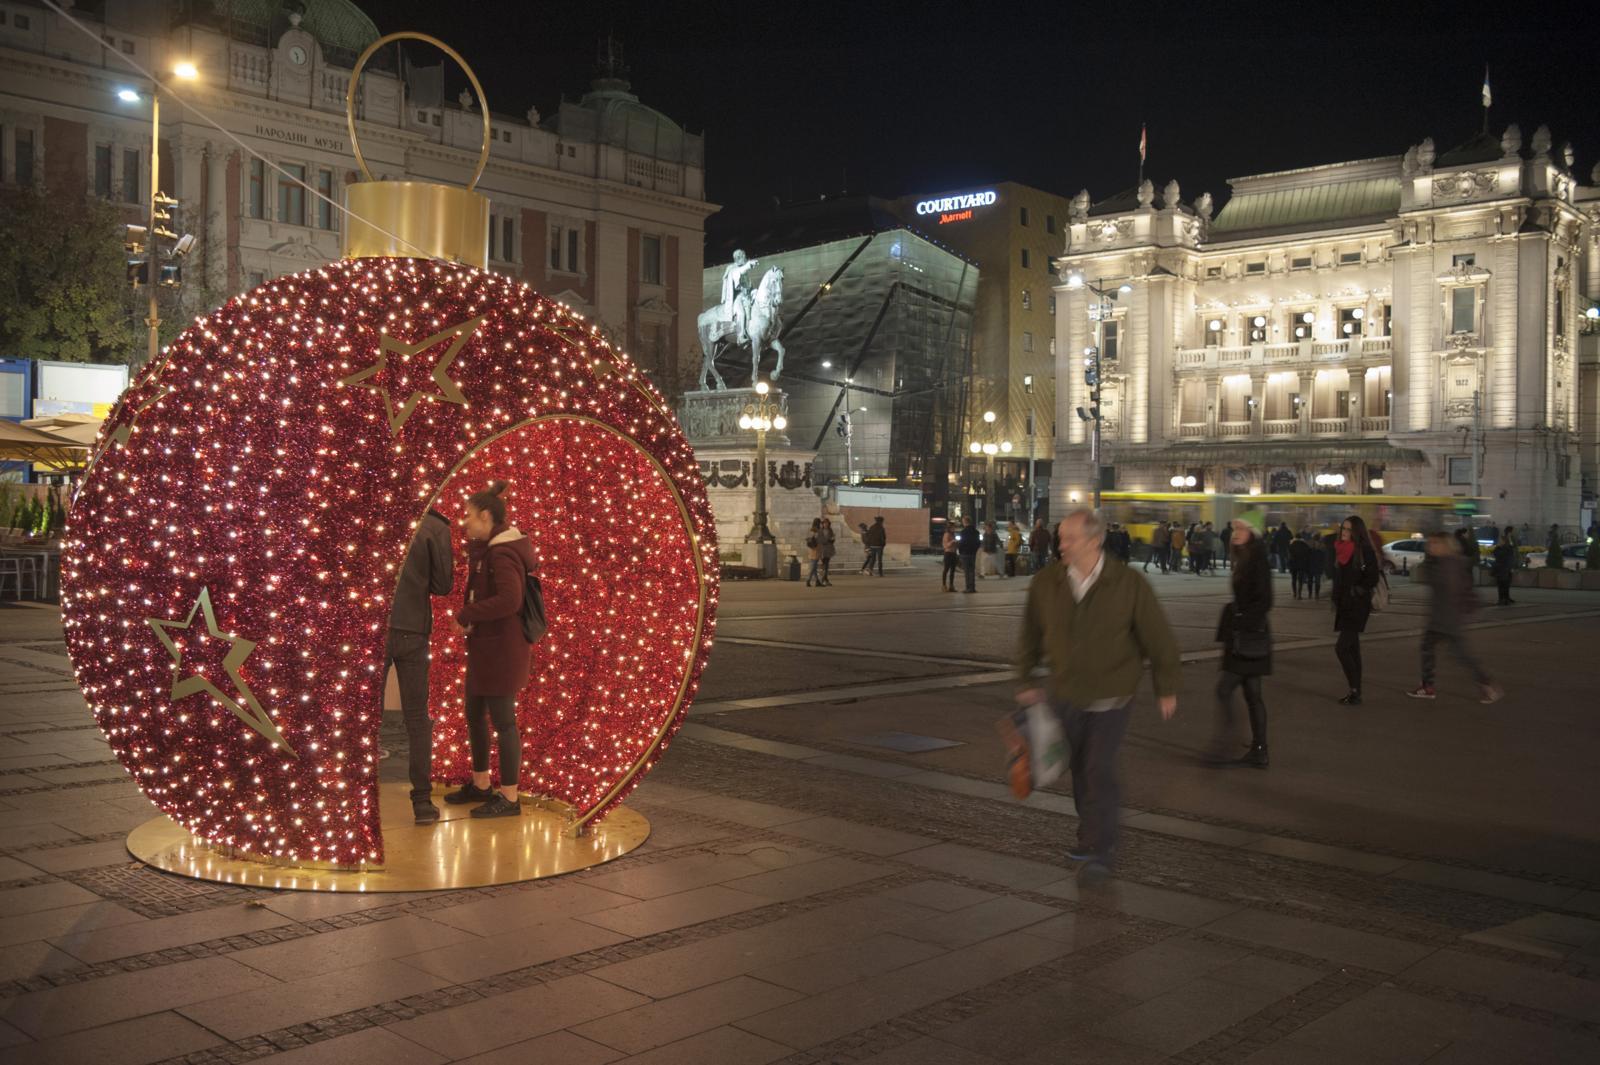 Srpski turizam - Beograd 940a2ffc4acf35c266a088afcaa5de40